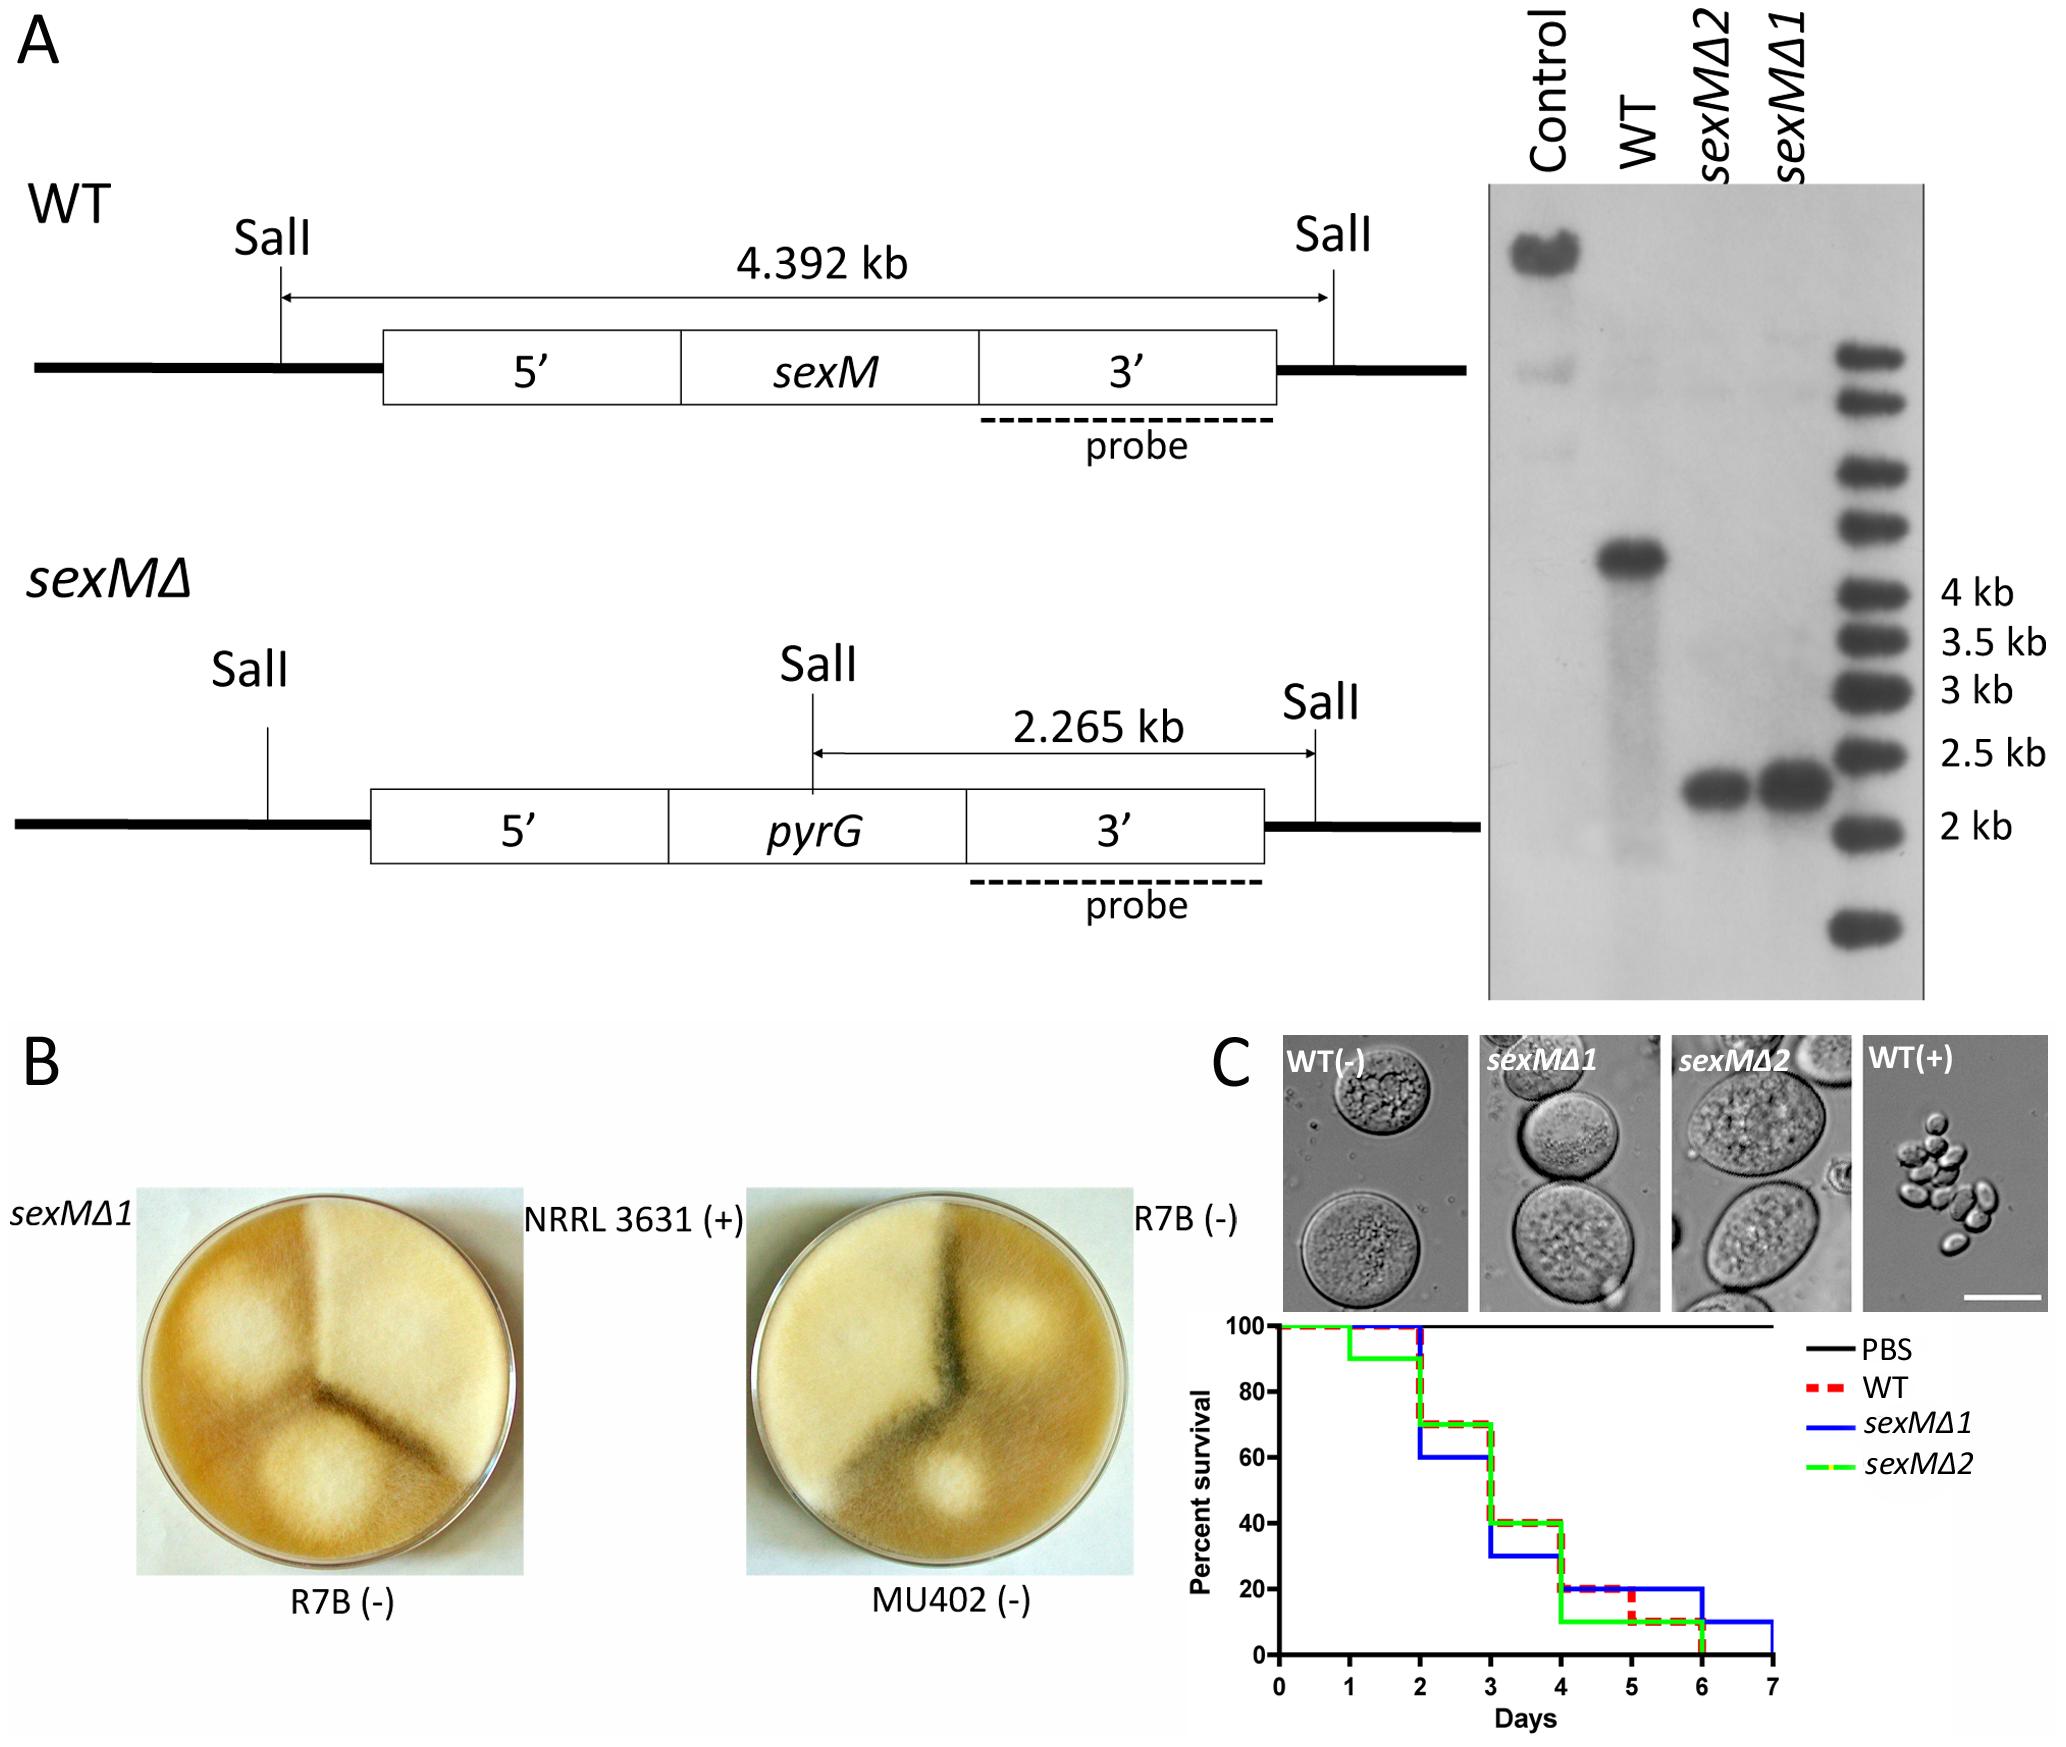 Disruption of the <i>sexM</i> gene and mating and virulence tests of the <i>sexM</i> mutants.